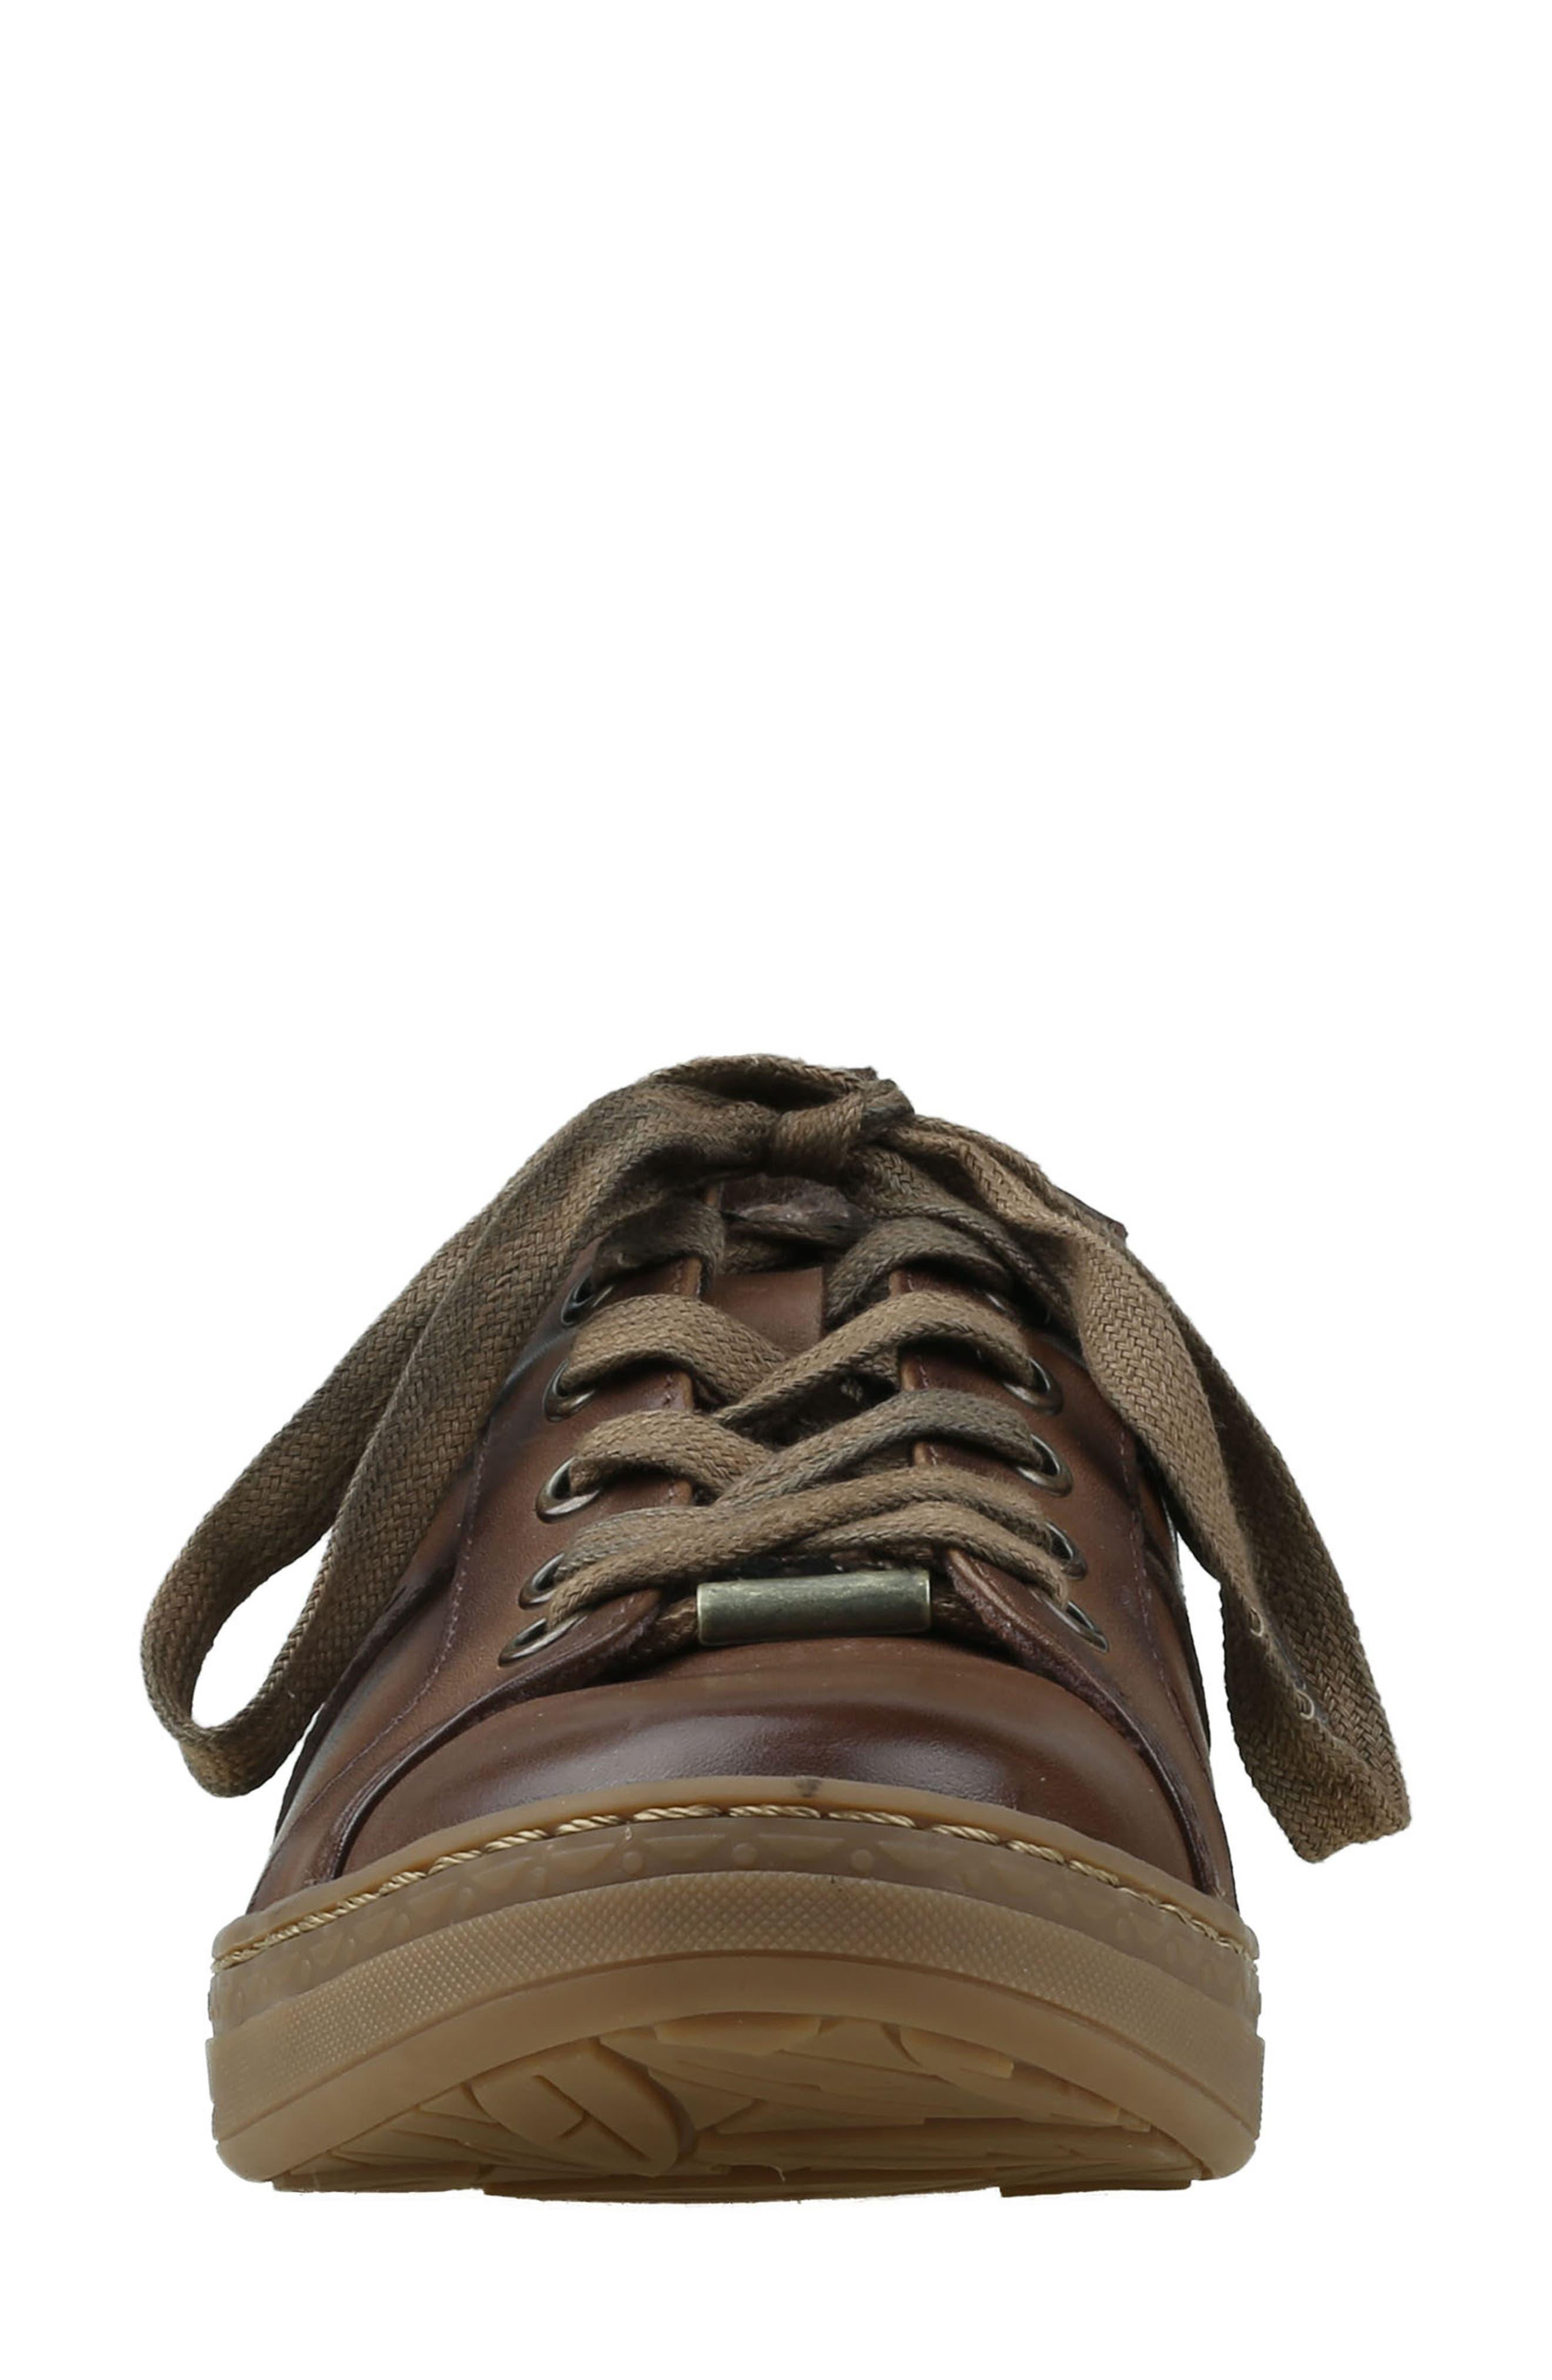 Zag Sneaker,                             Alternate thumbnail 29, color,